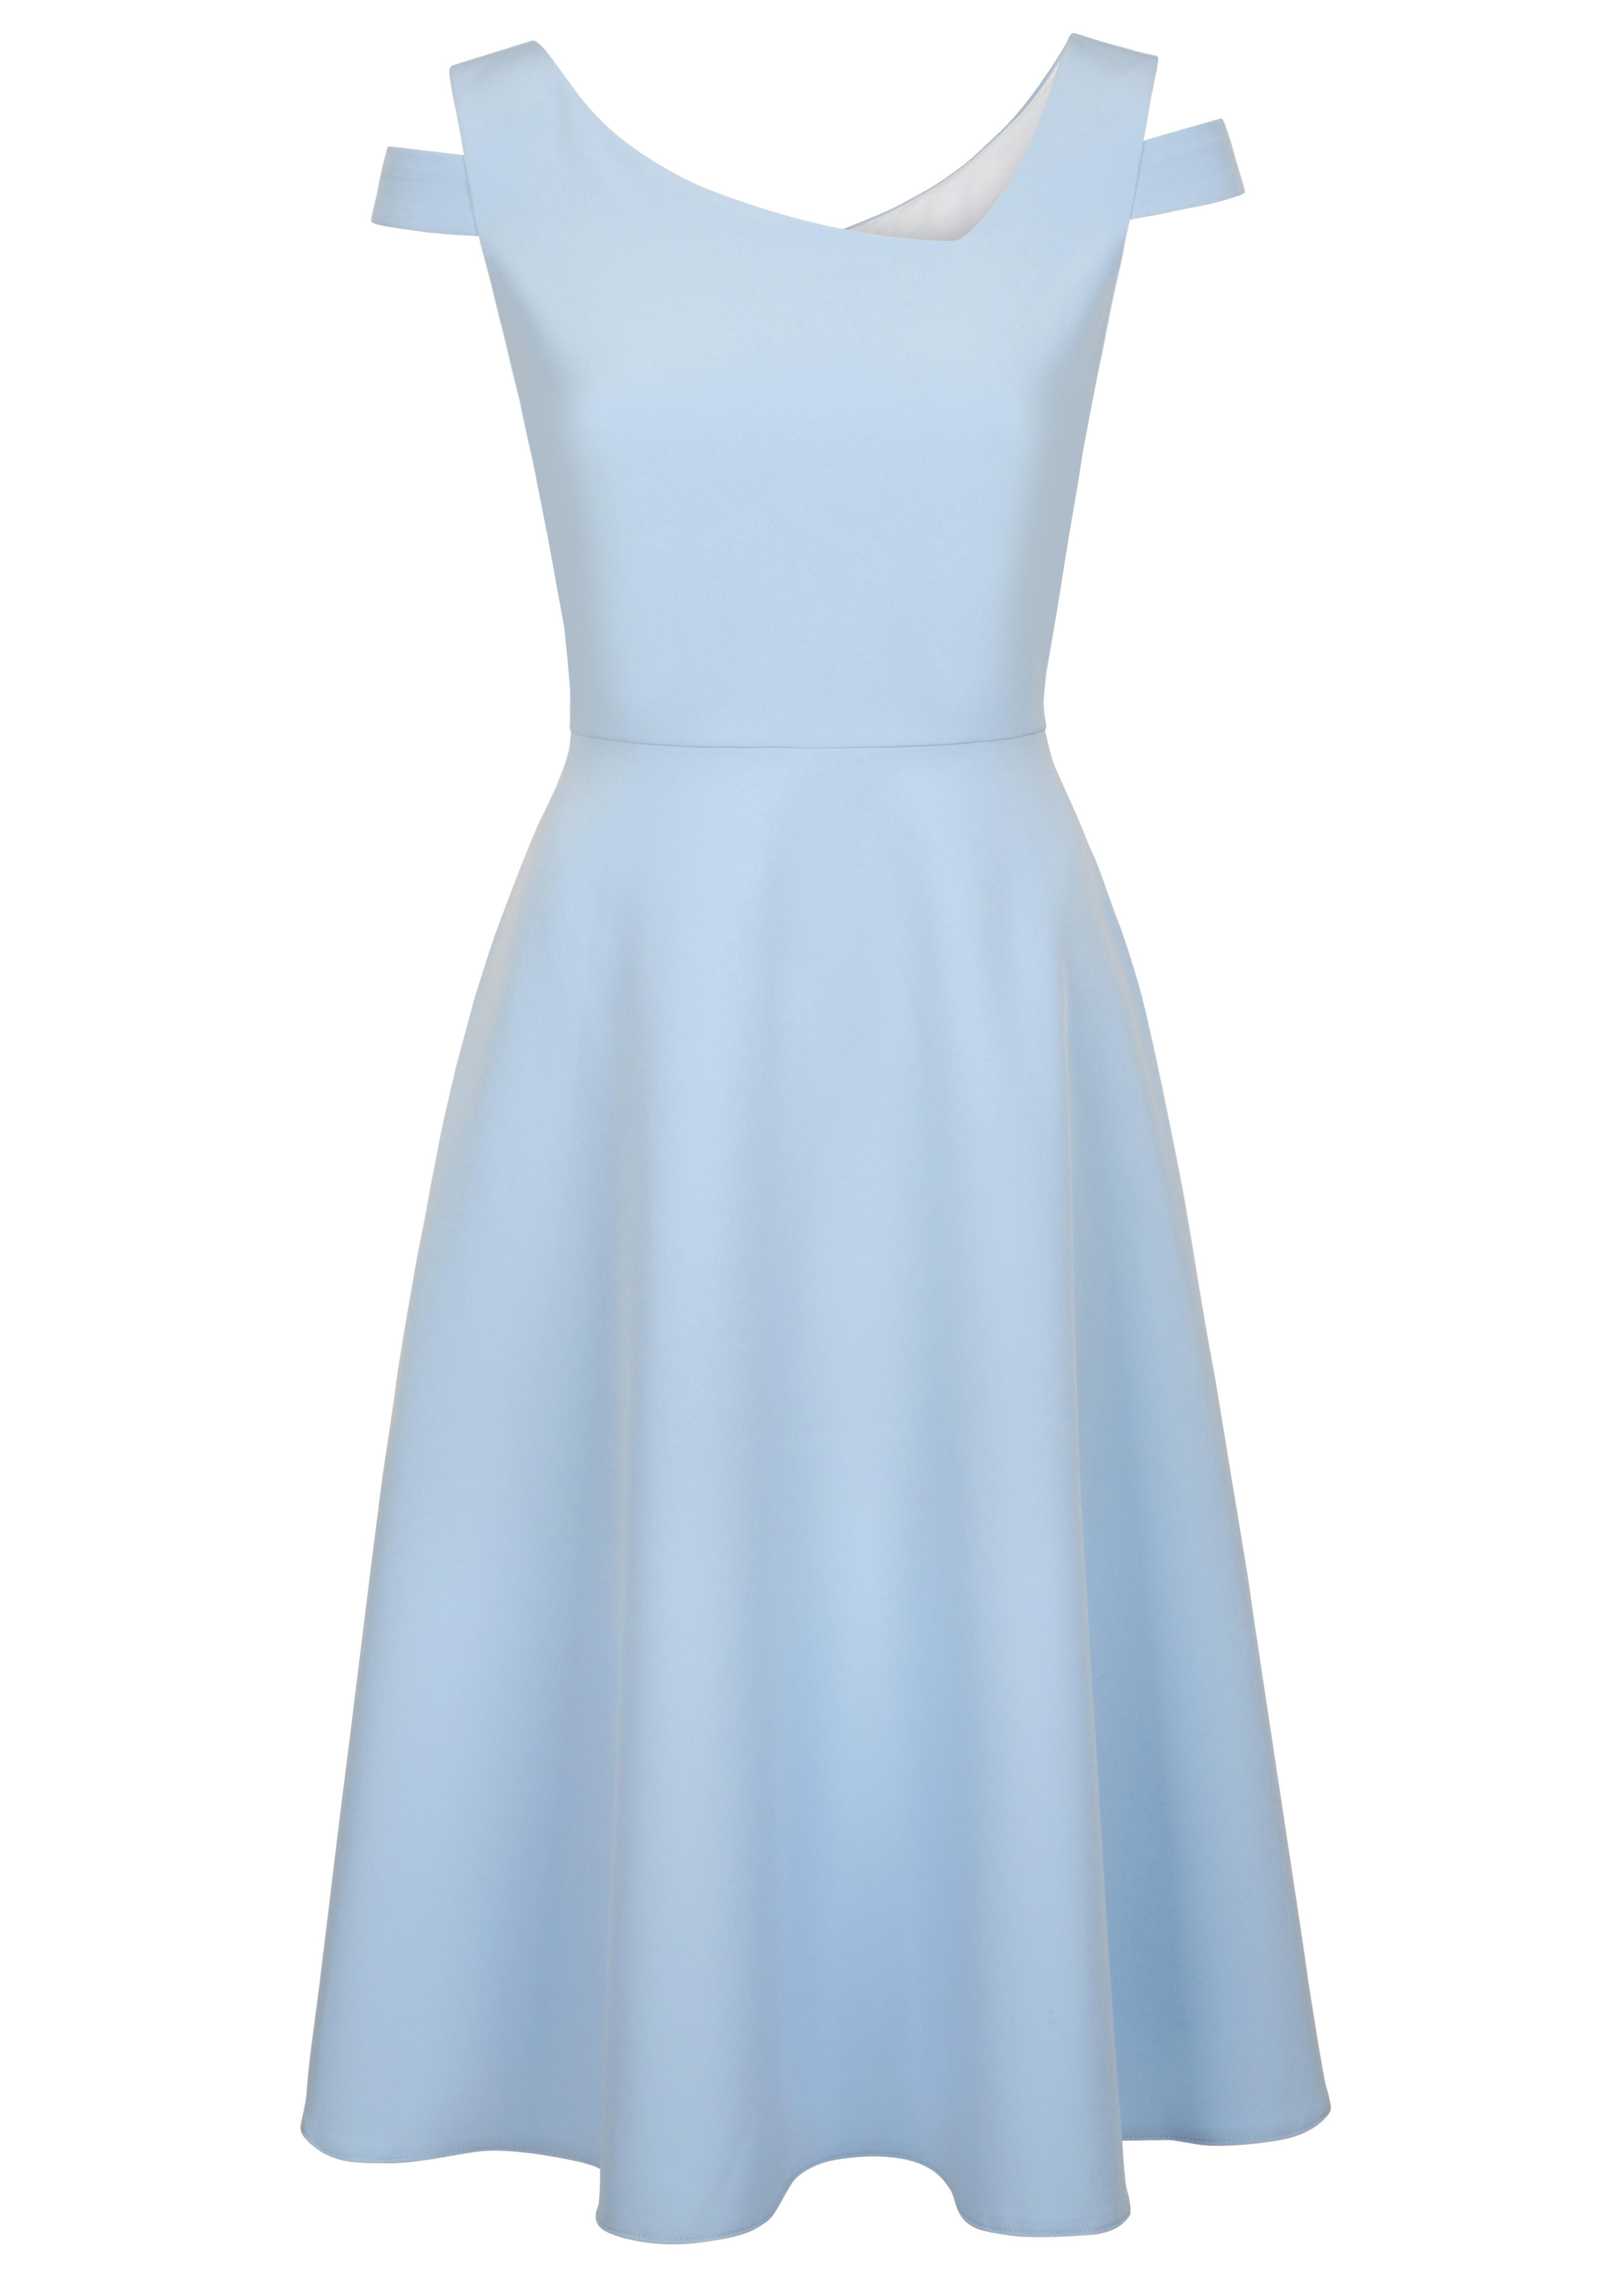 Fee G asymmetrical Neck Dress